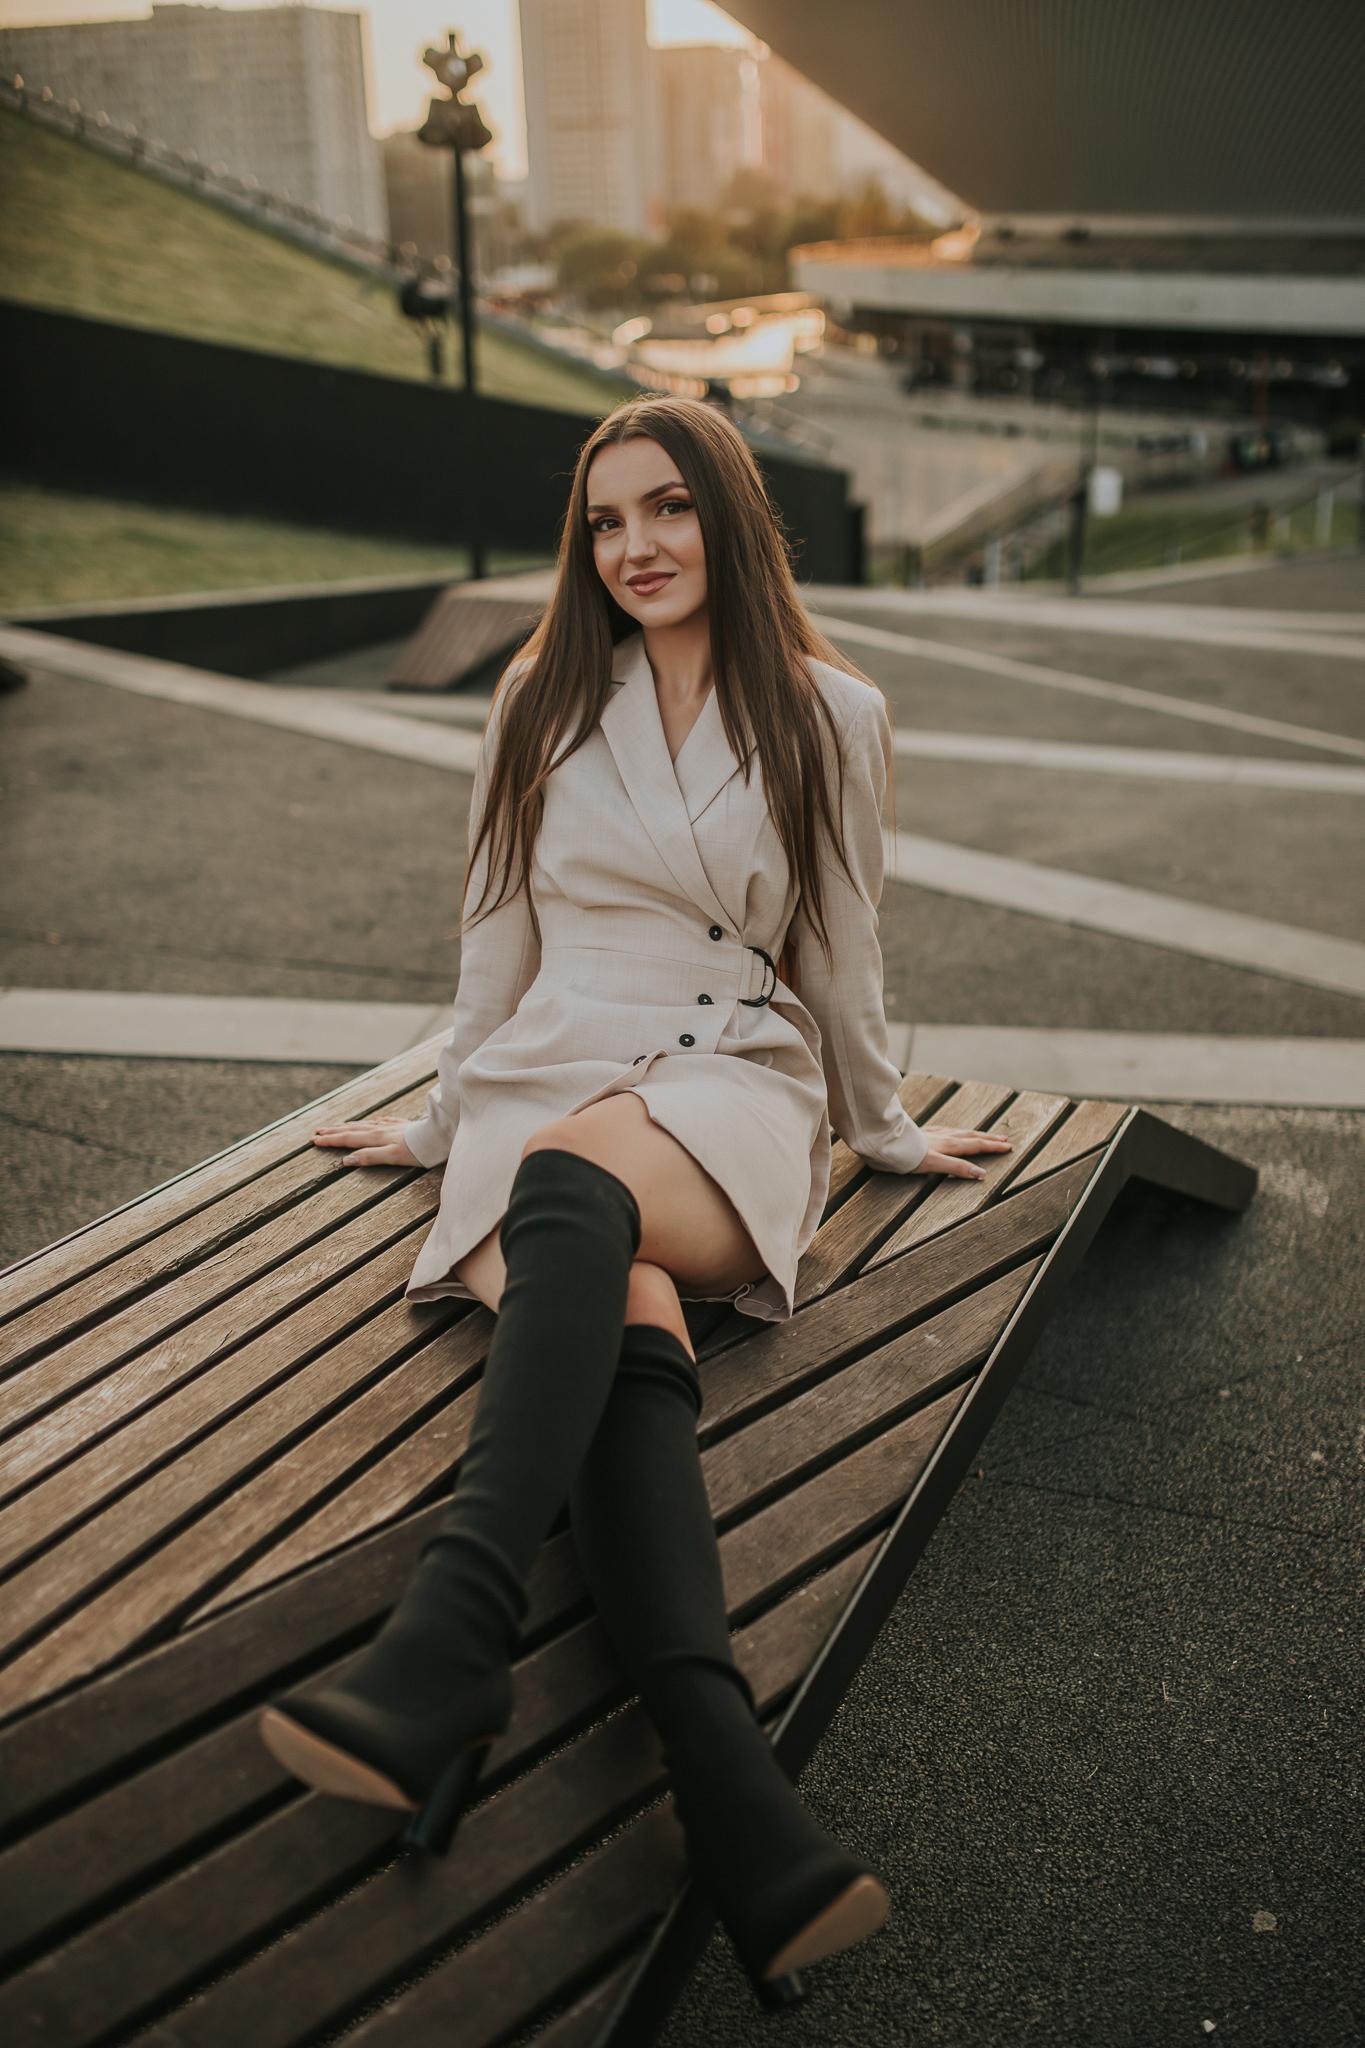 Sesje plenerowa Wiktoria Kartonii INTERNET-33